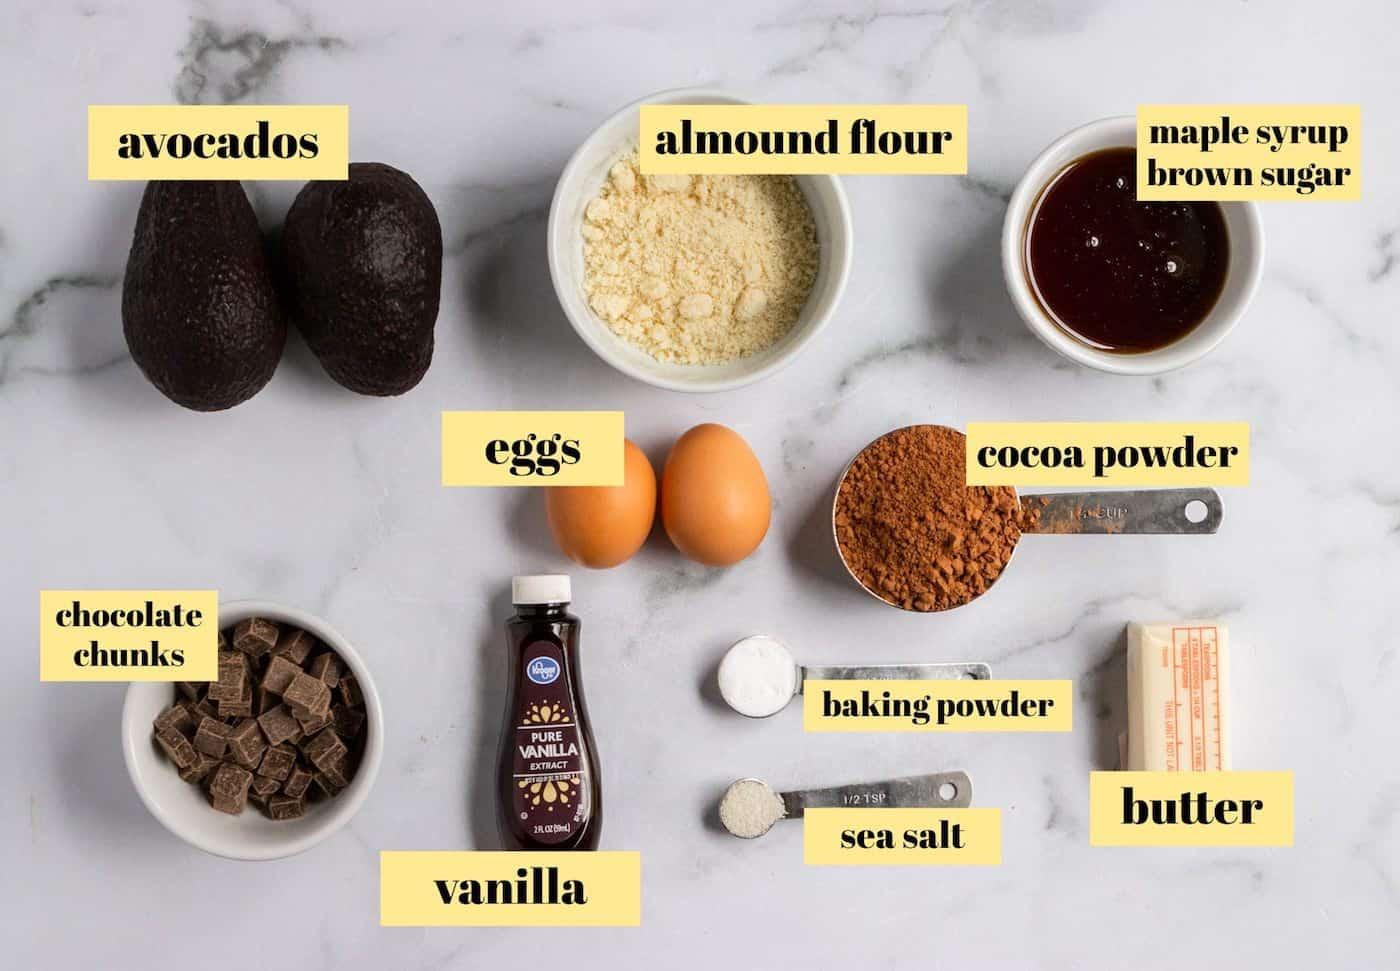 Avocado brownie ingredients with labels.